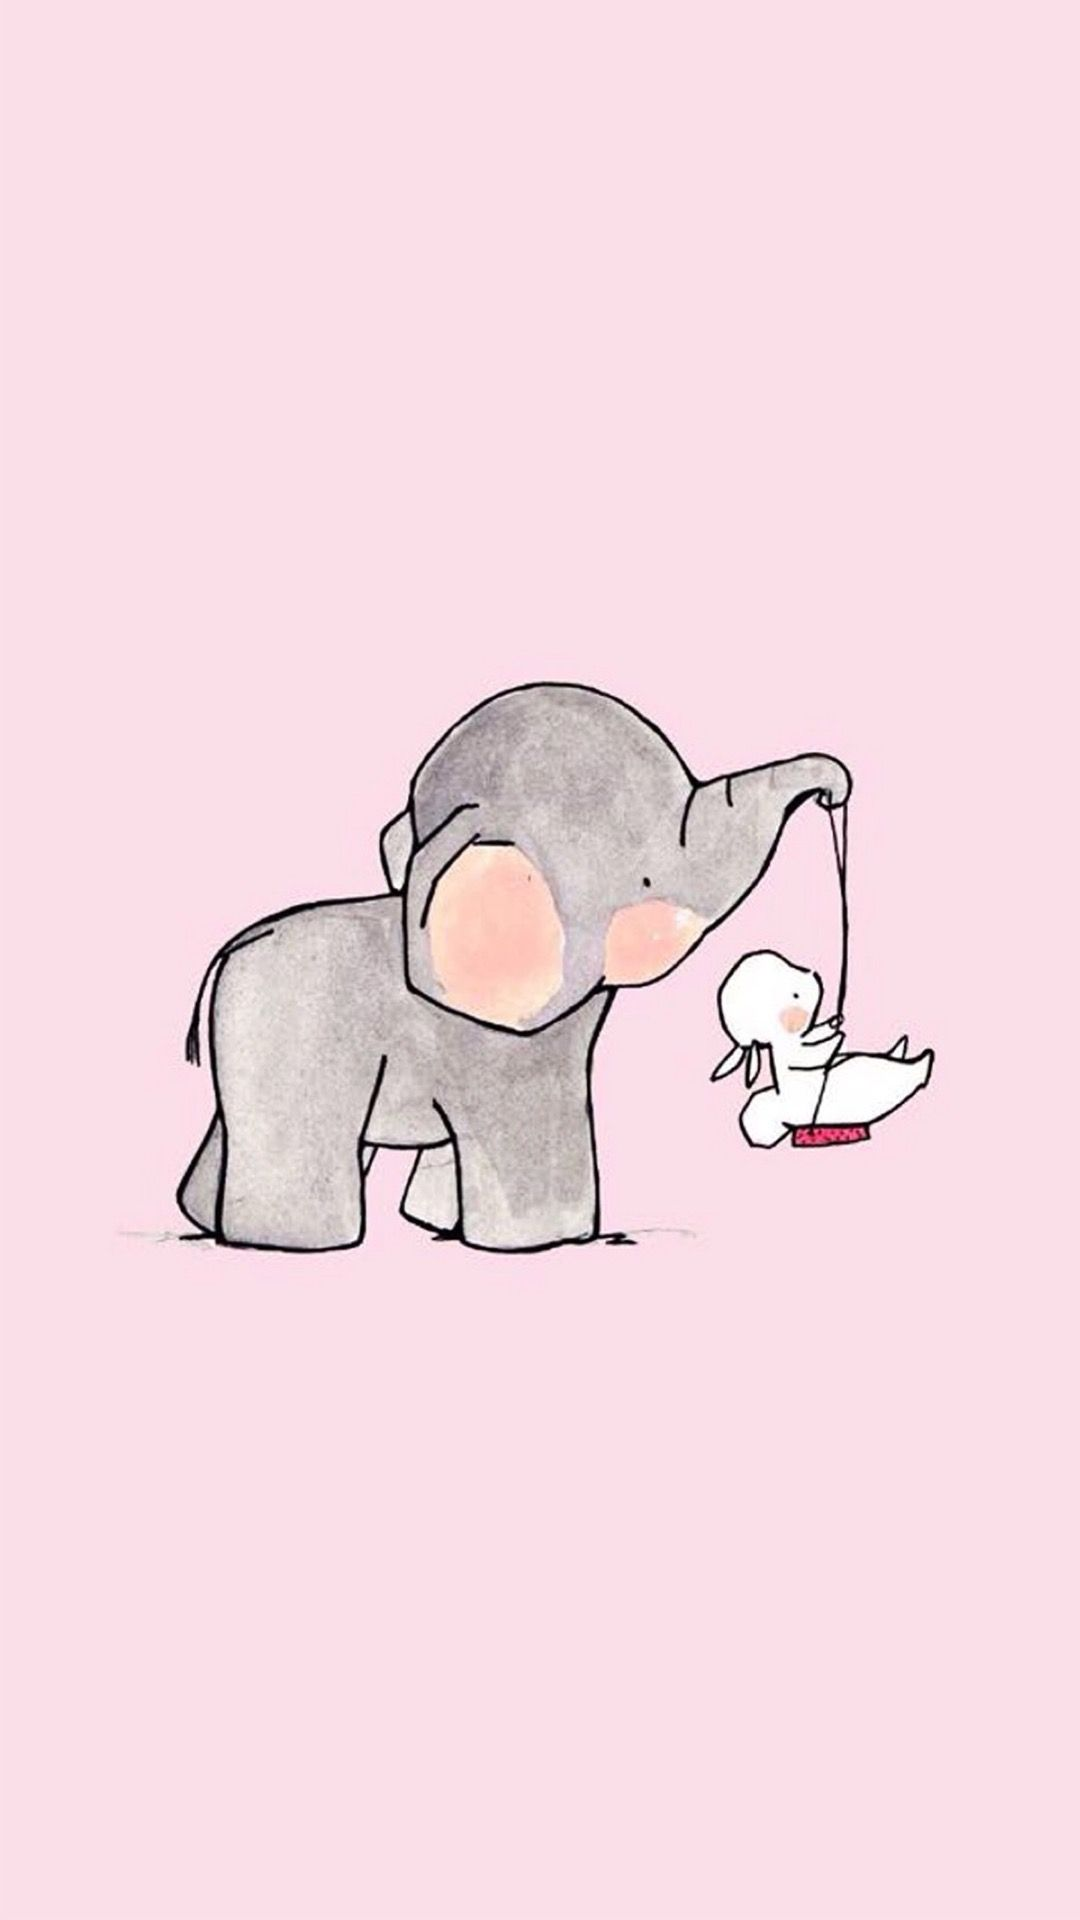 Baby Elephants With Mother Cute Wallpaper Jpg 1920 1080 Tiere Niedliche Tiere Elefanten